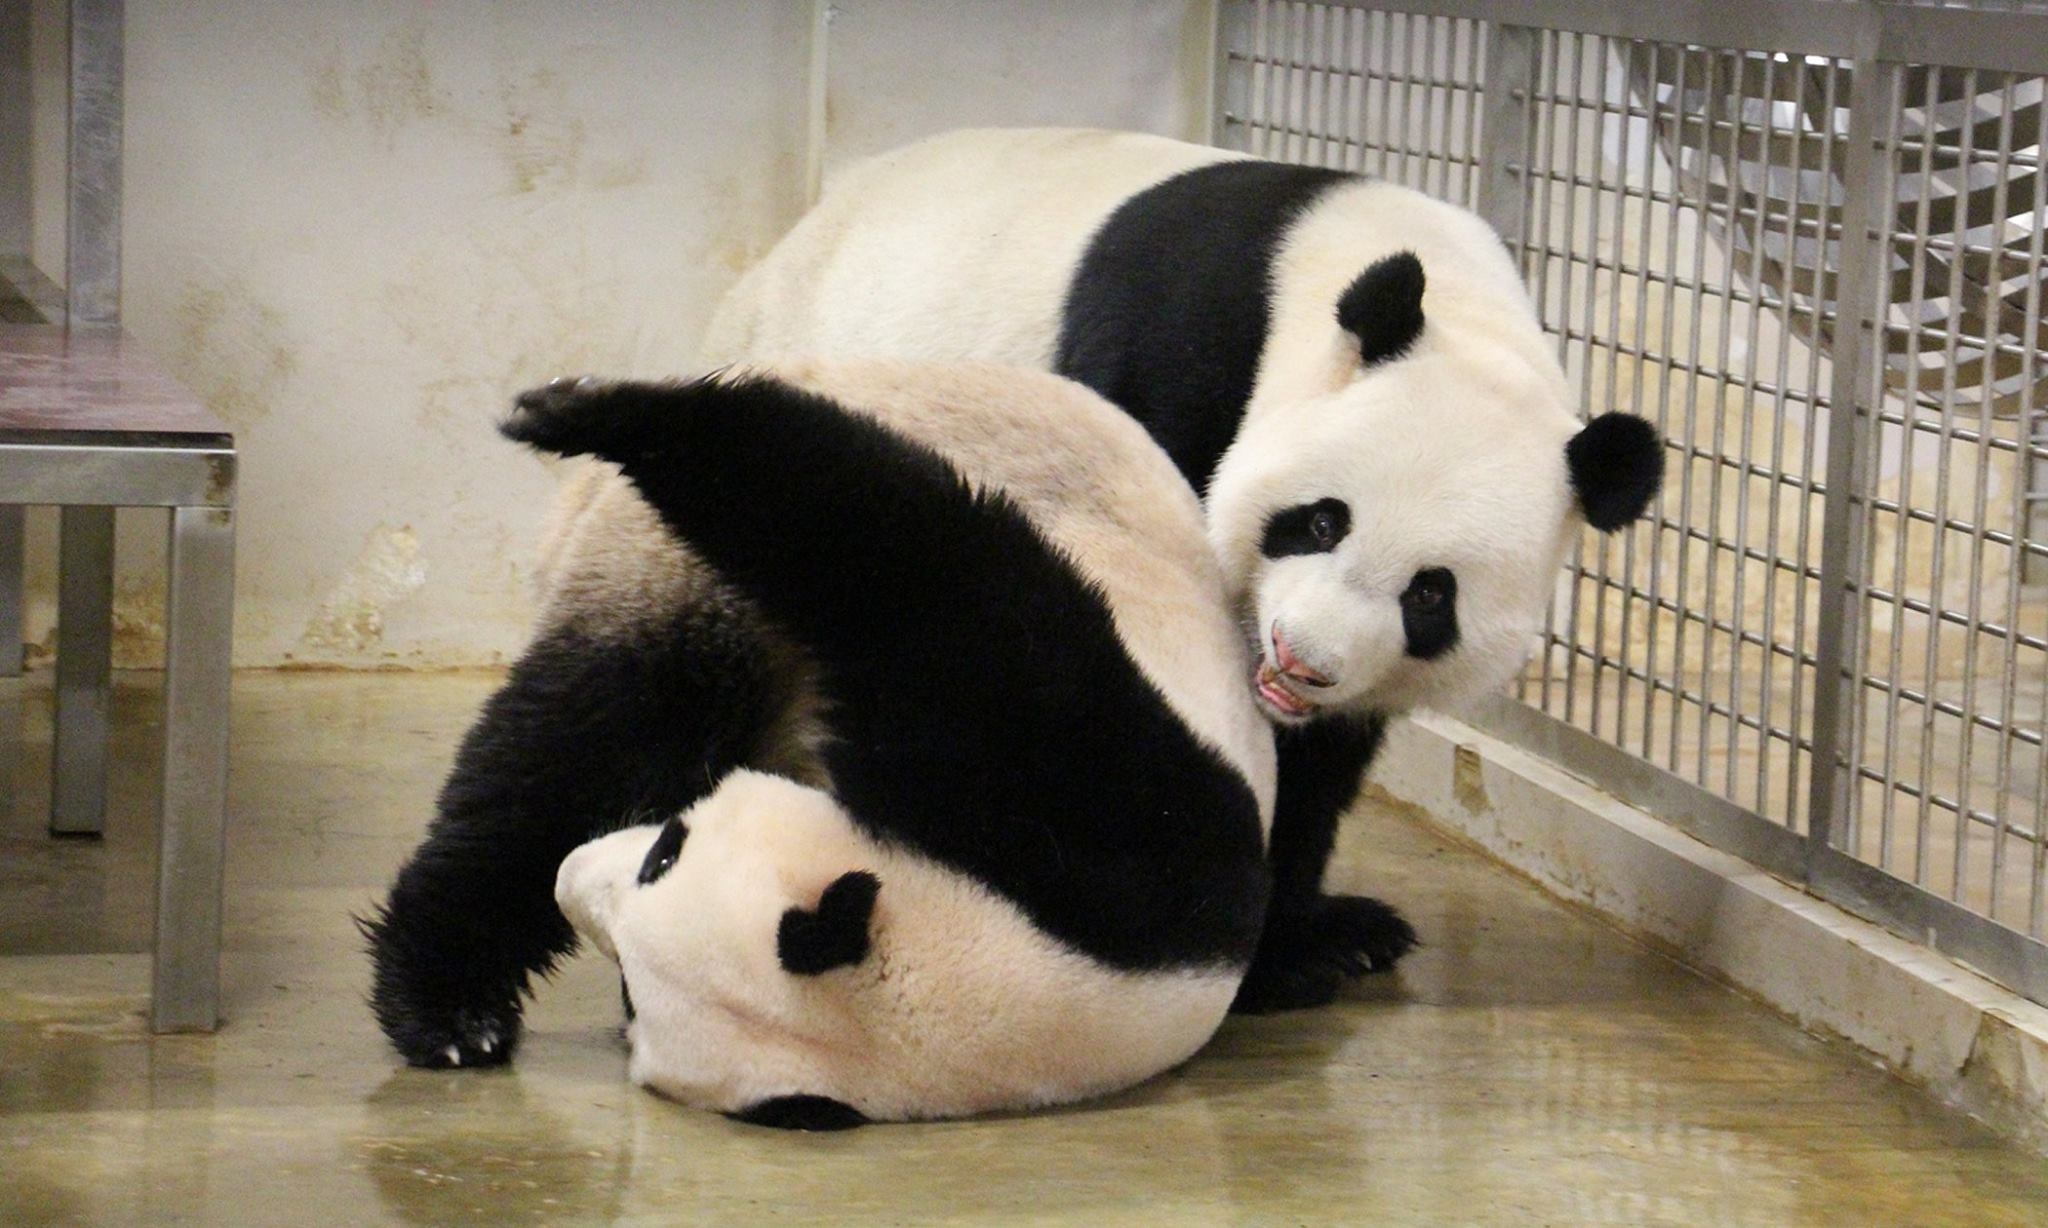 It's panda mating season at the River Safari